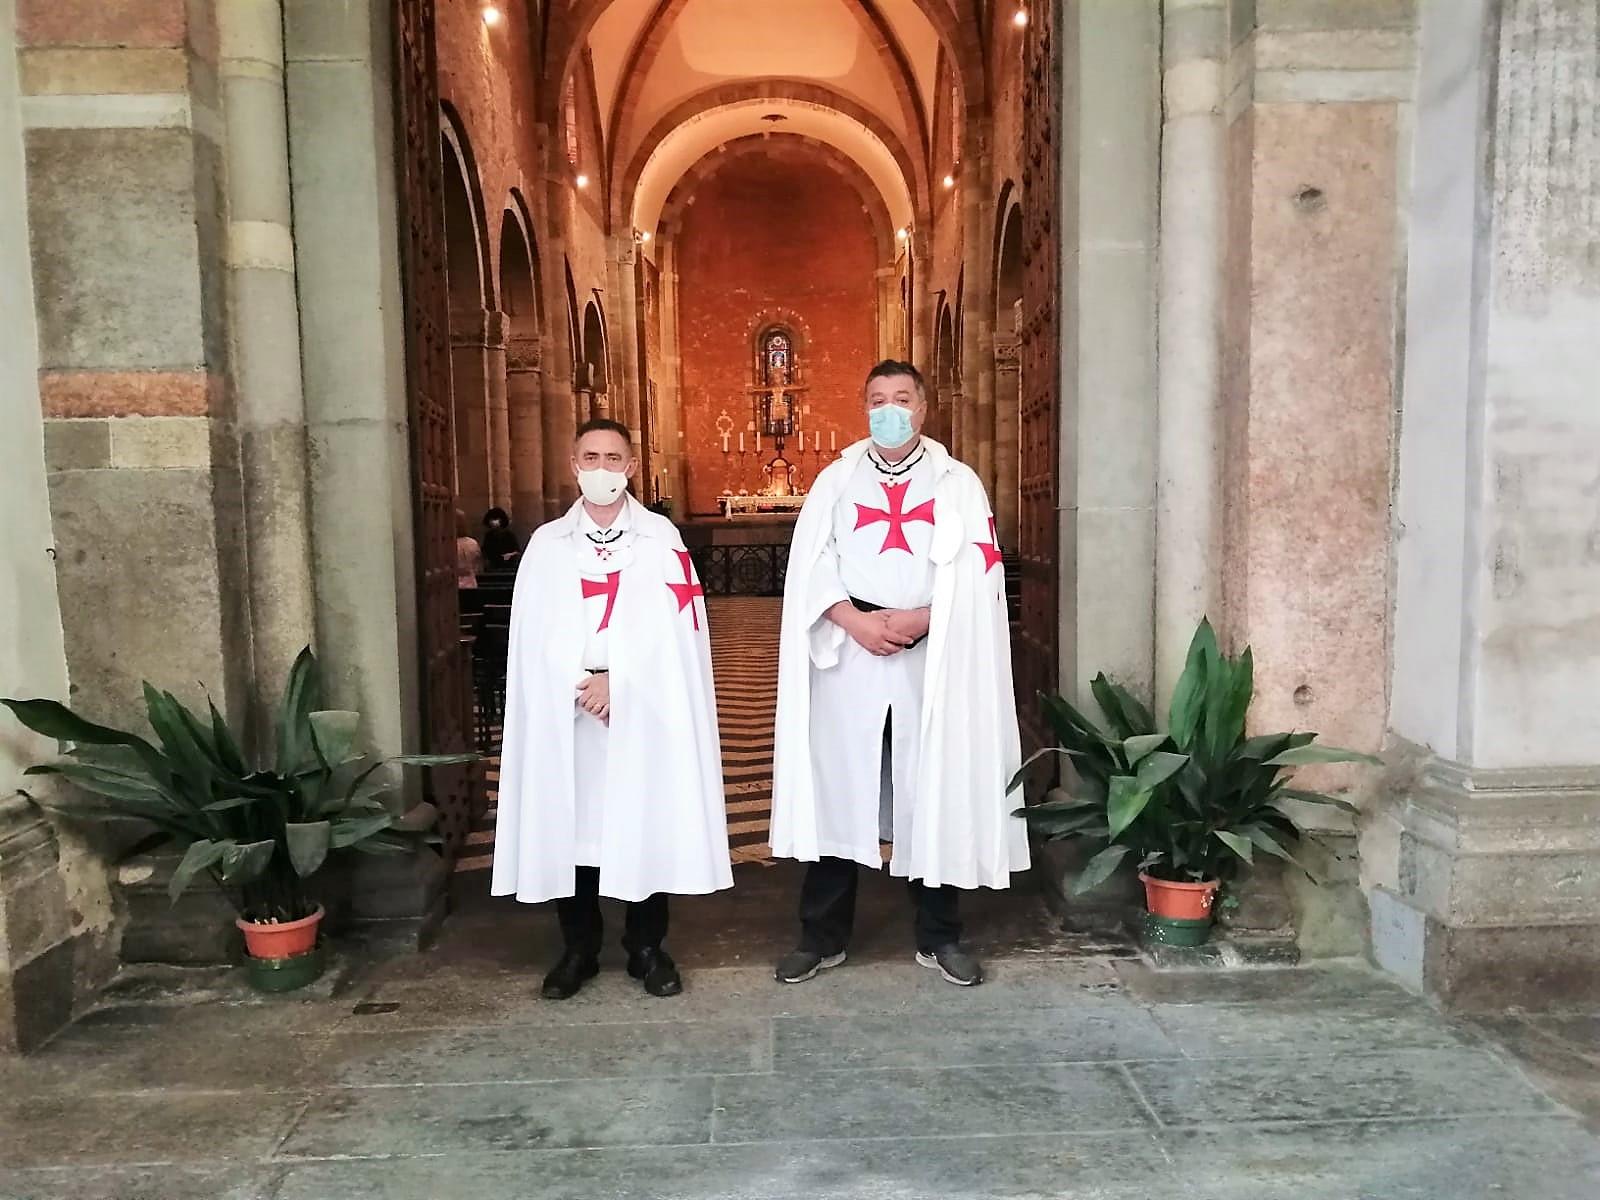 Custodia Chiesa di San Savino – Piacenza 18.09.2021